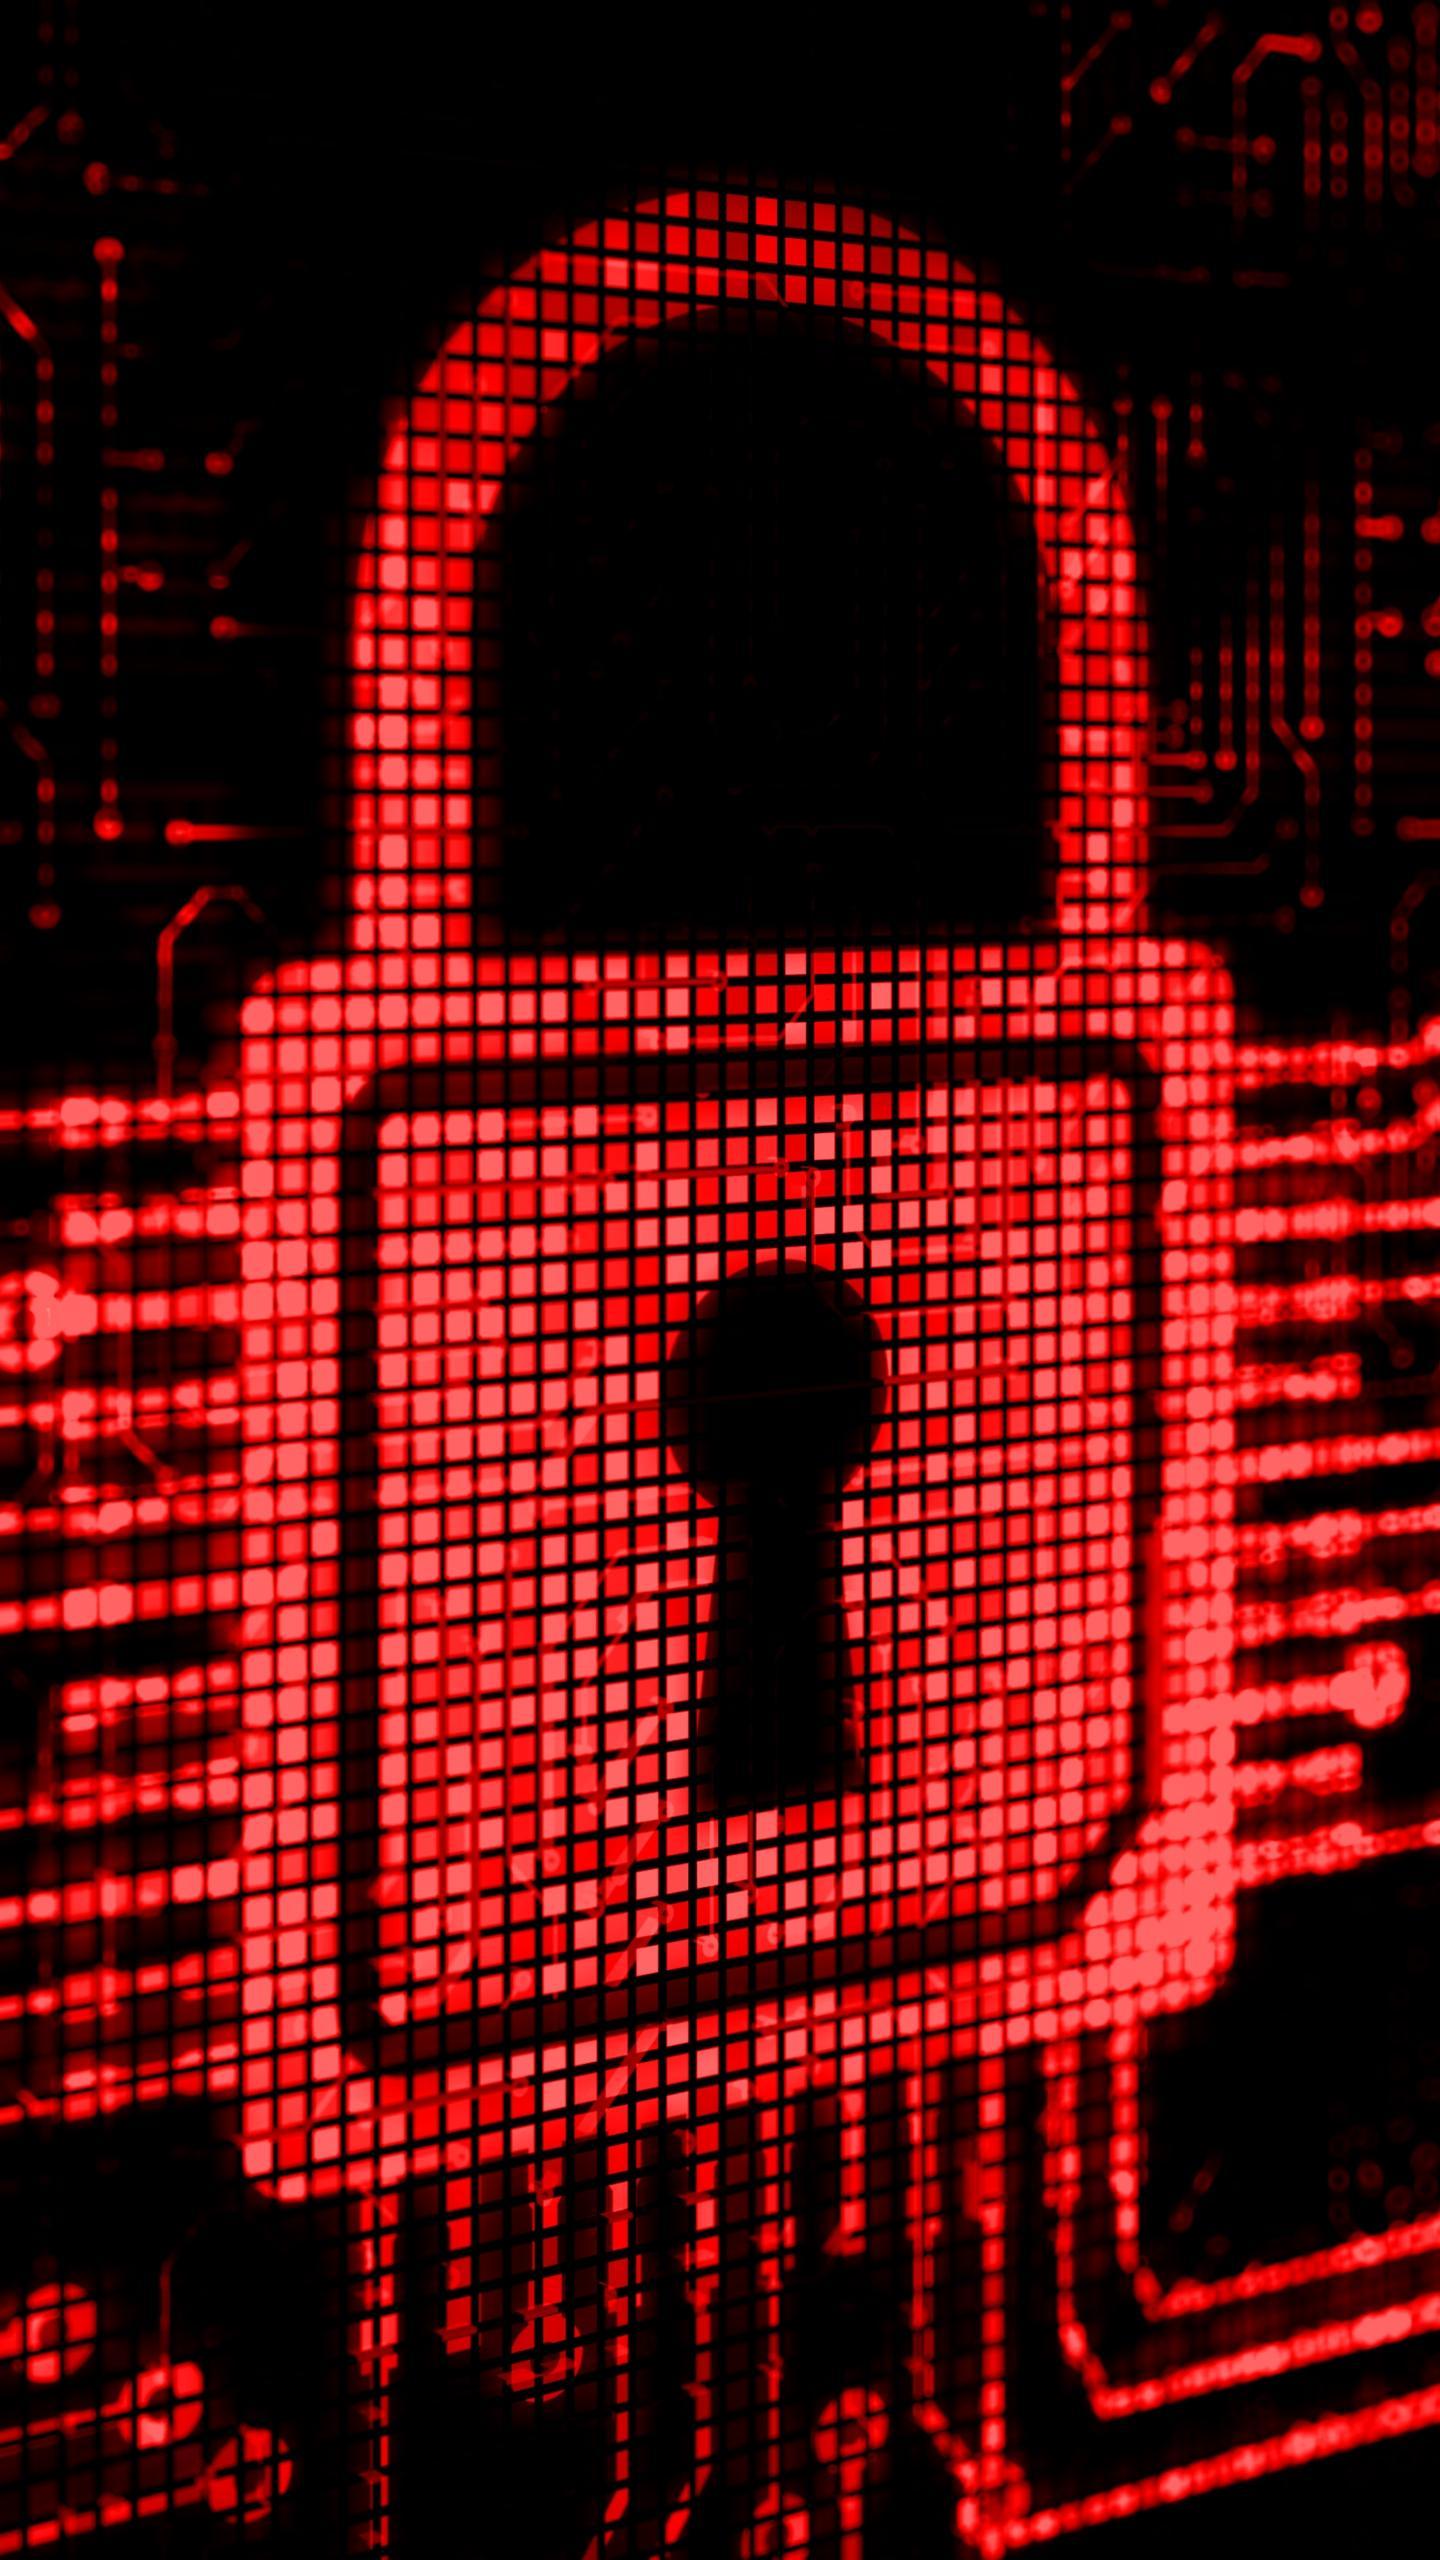 Lock Screen Background HD Wallpaper - 067